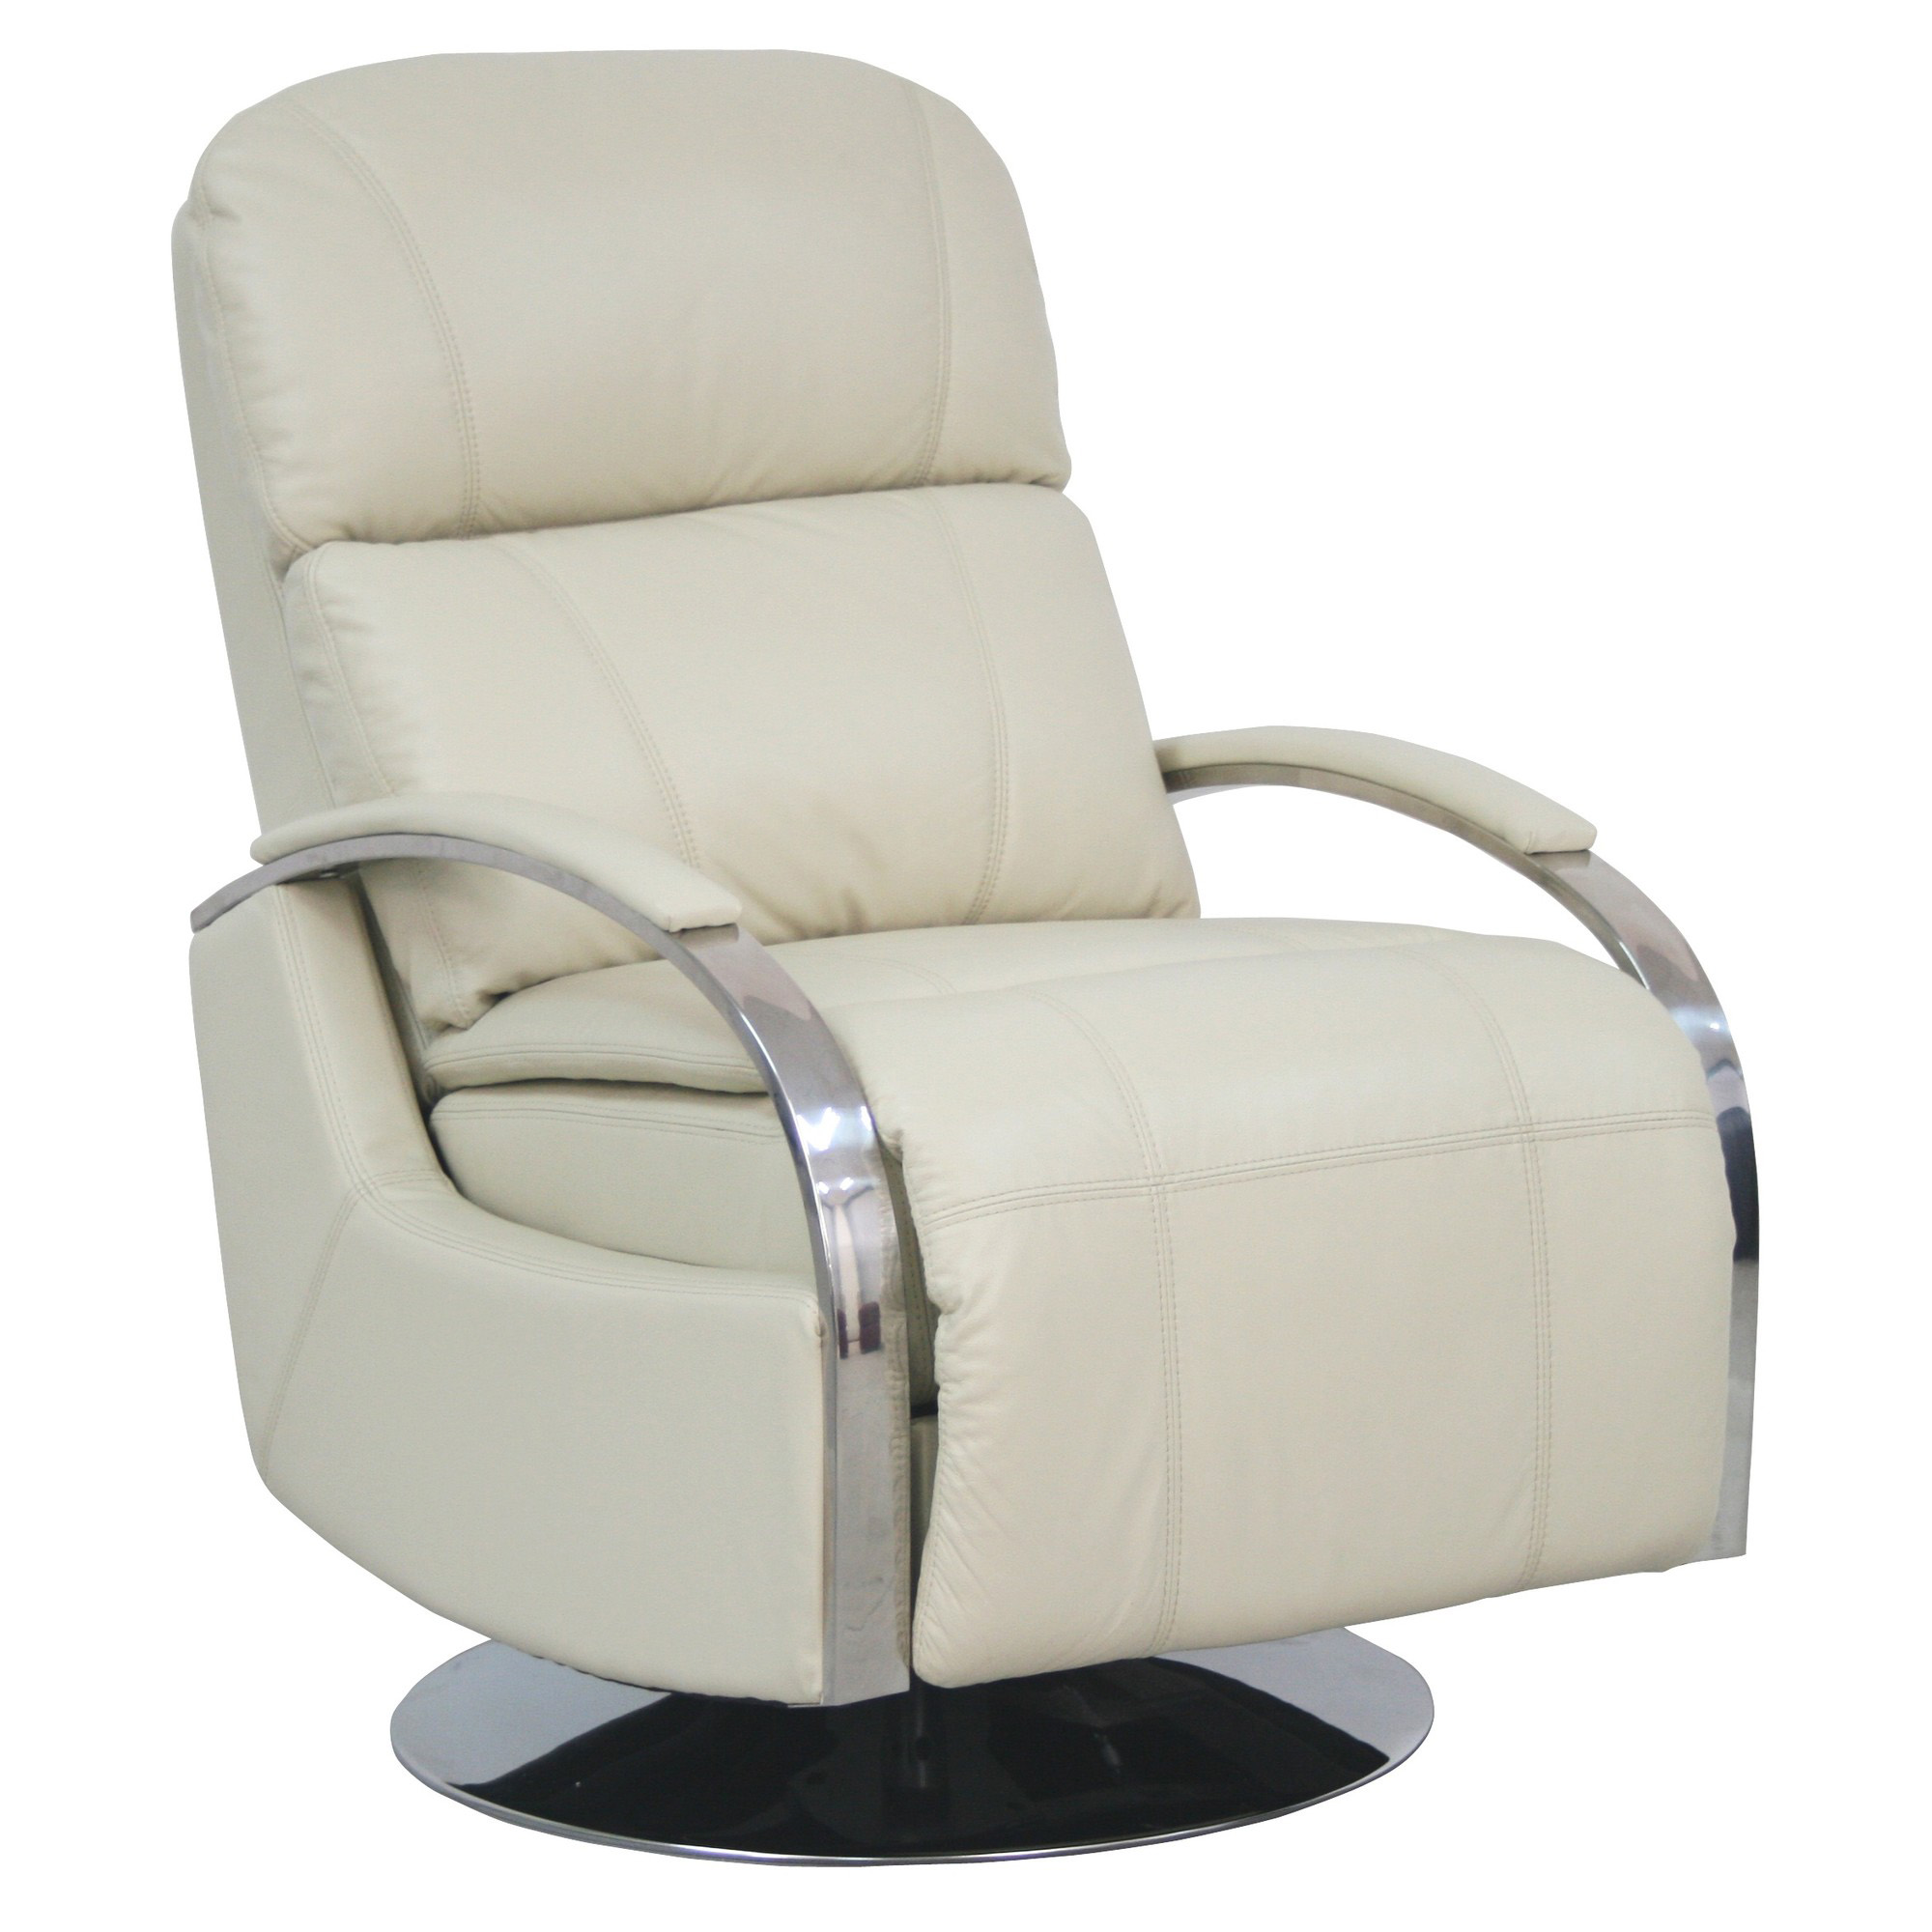 euro recliner chair black covers australia swivel amazon com coaster casual